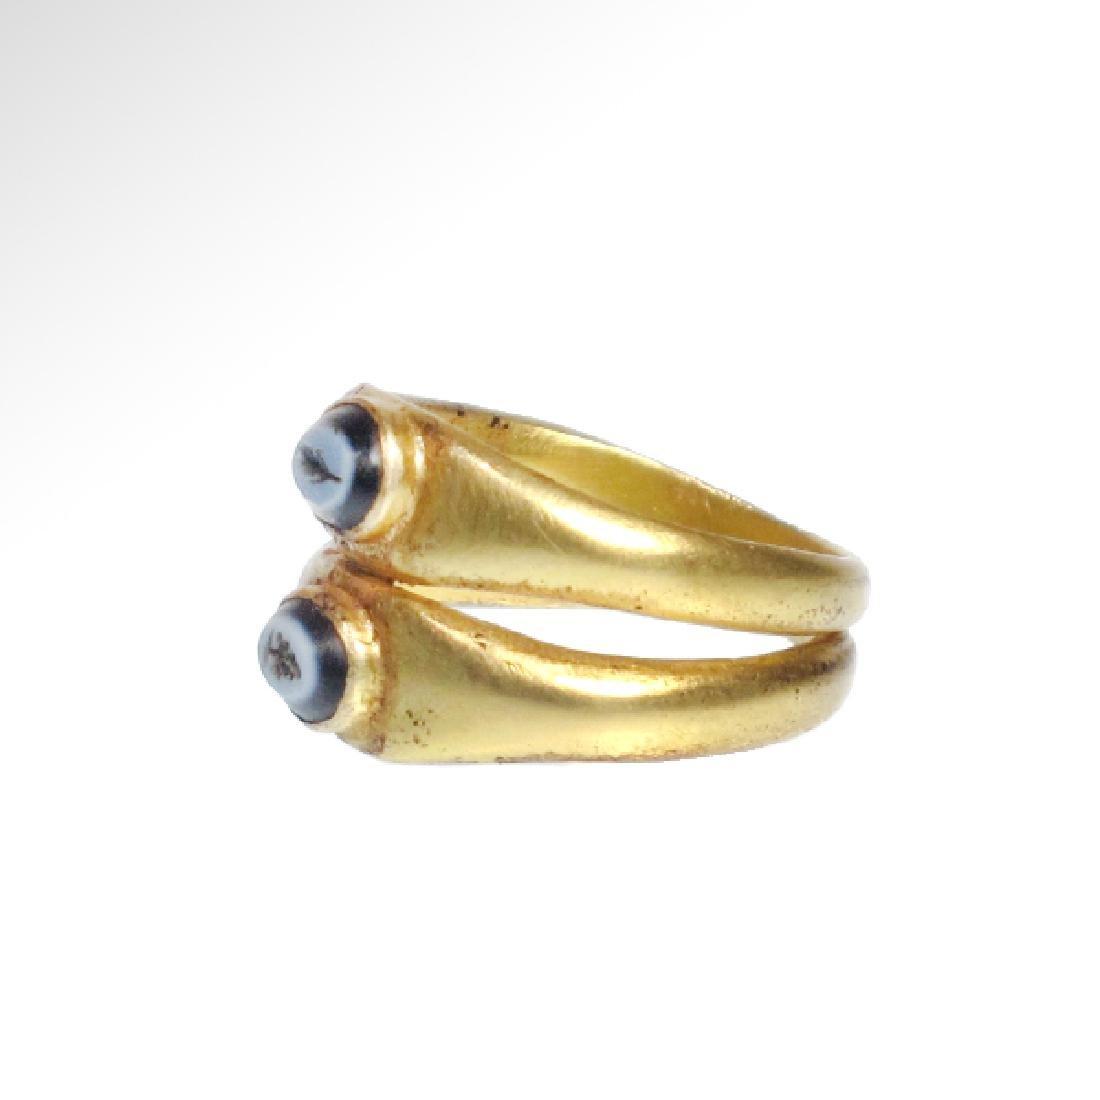 Roman Gold Double Ring, Onyx Intaglios, c. 2nd Century - 5